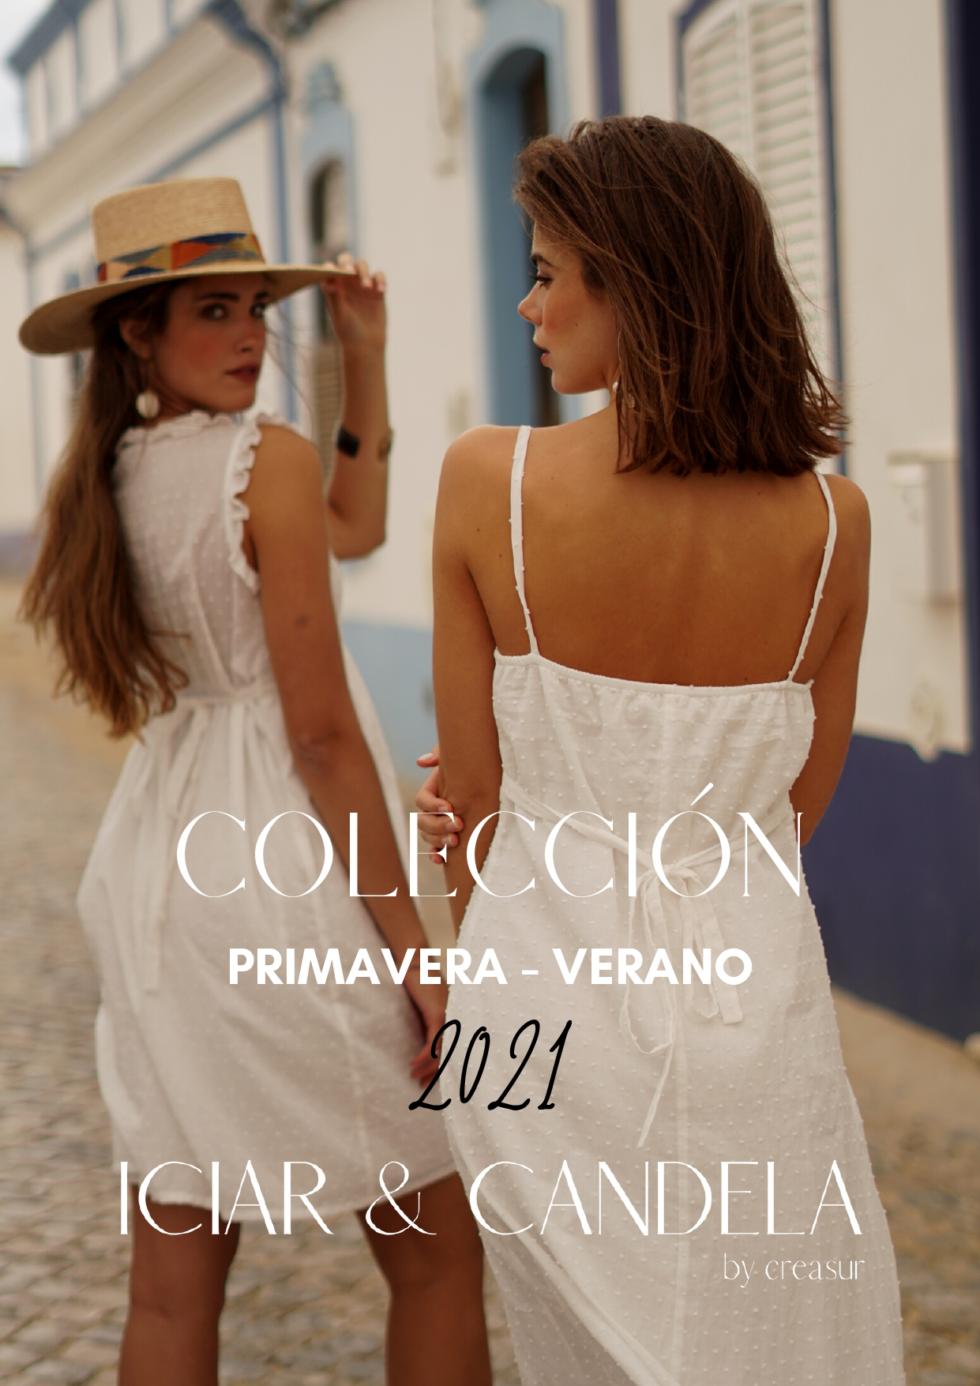 Catálogo IYC_vmovil_sin precio_page-0001